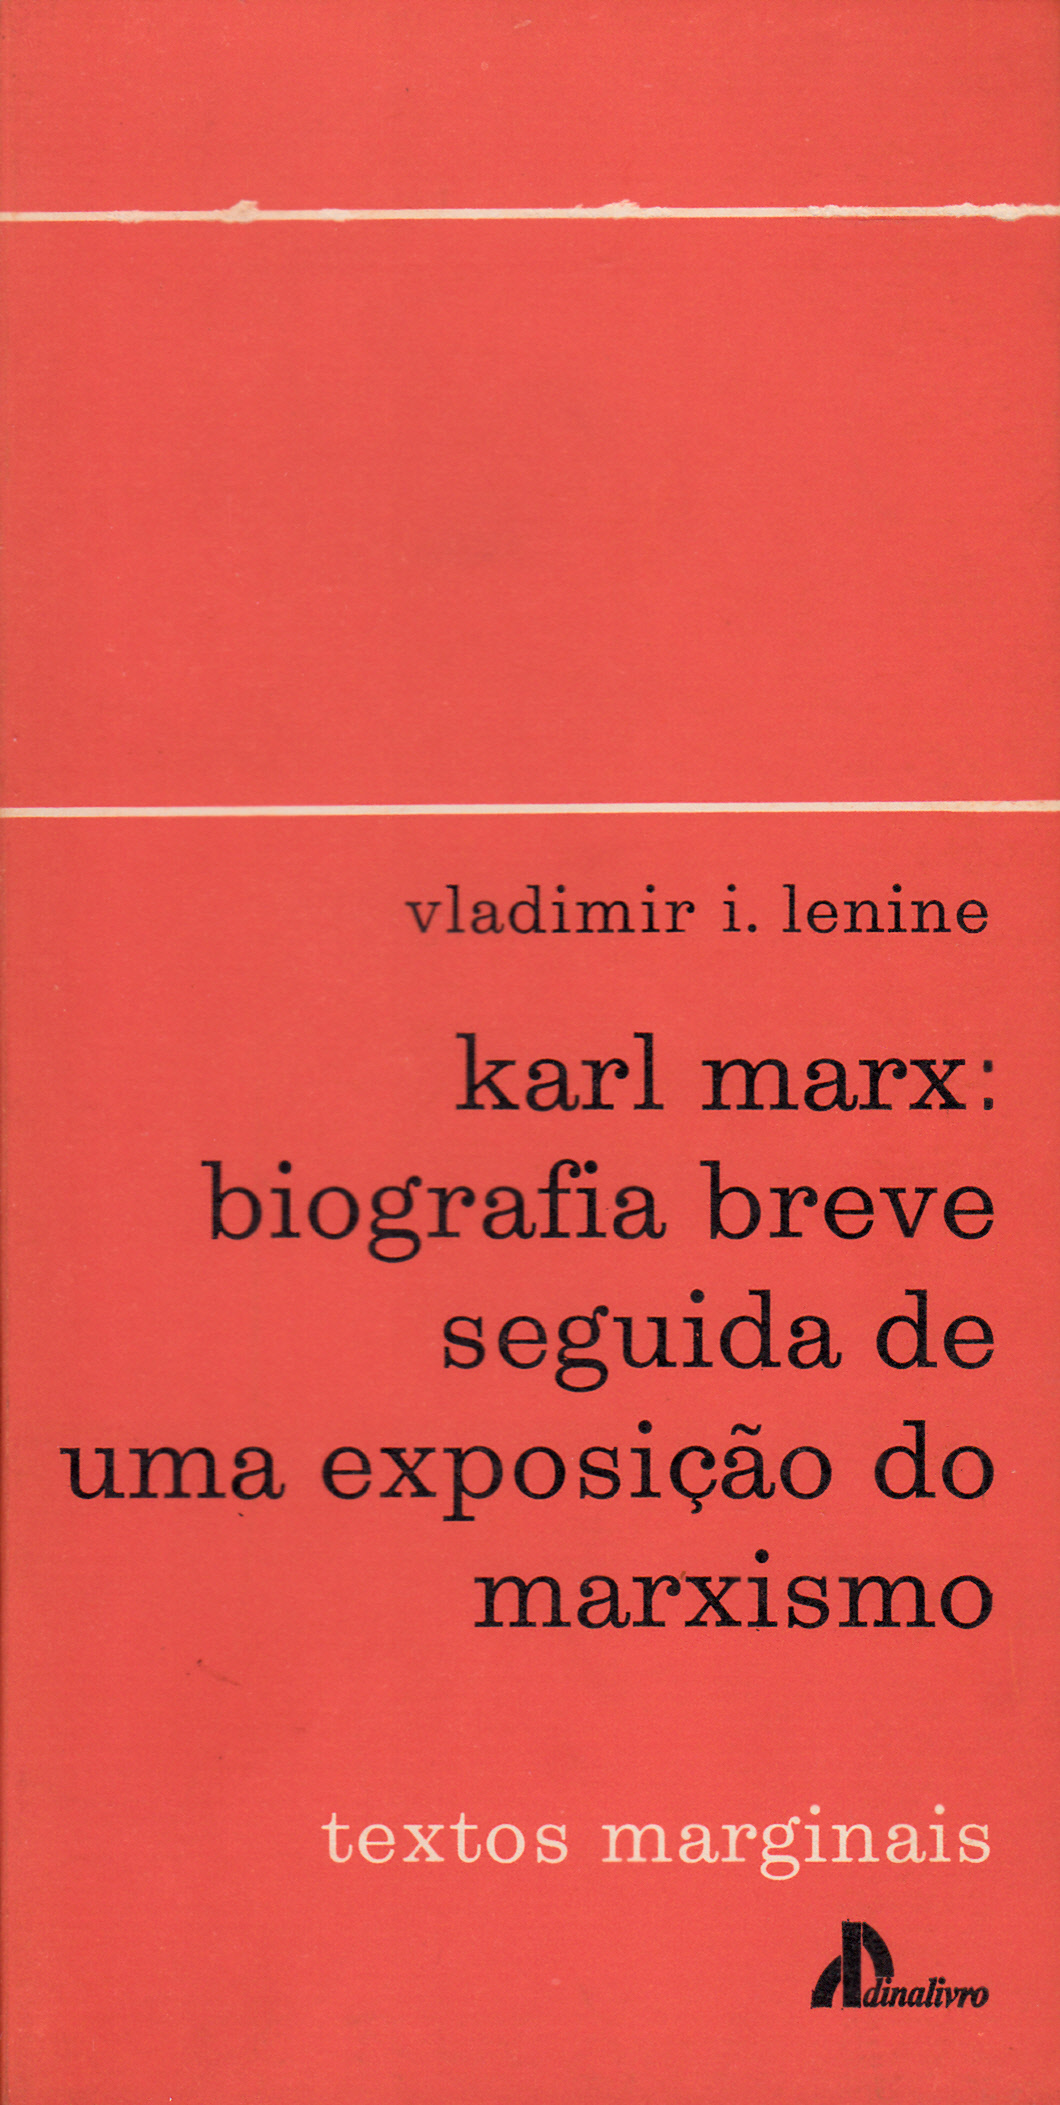 Textos _Marginais_